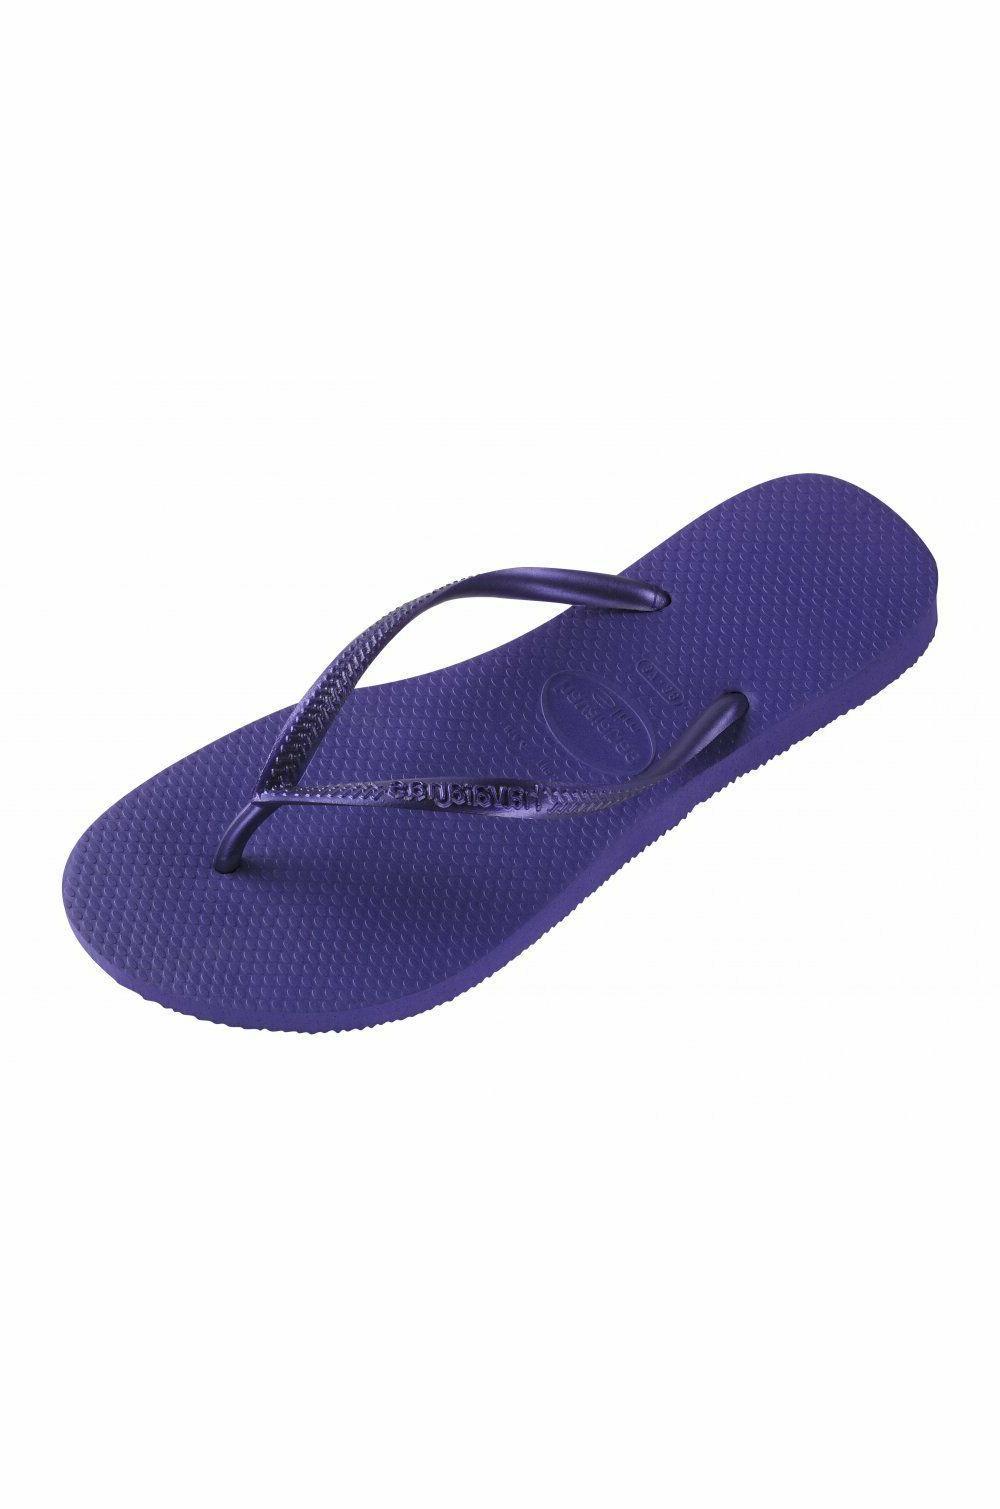 Original Flip Flops, Made Brasil, Navy Blue Purple.